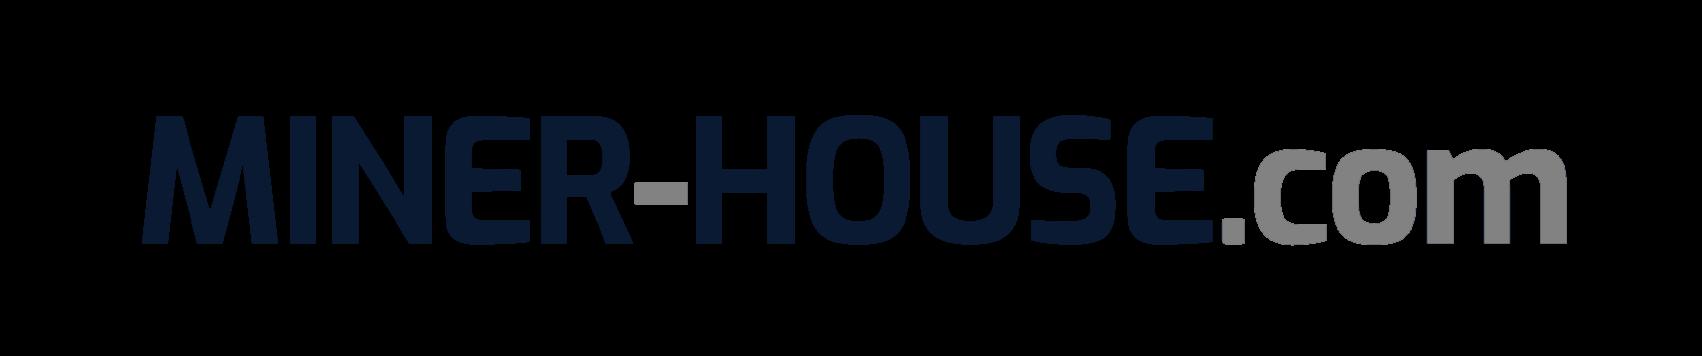 Miner-House.Com